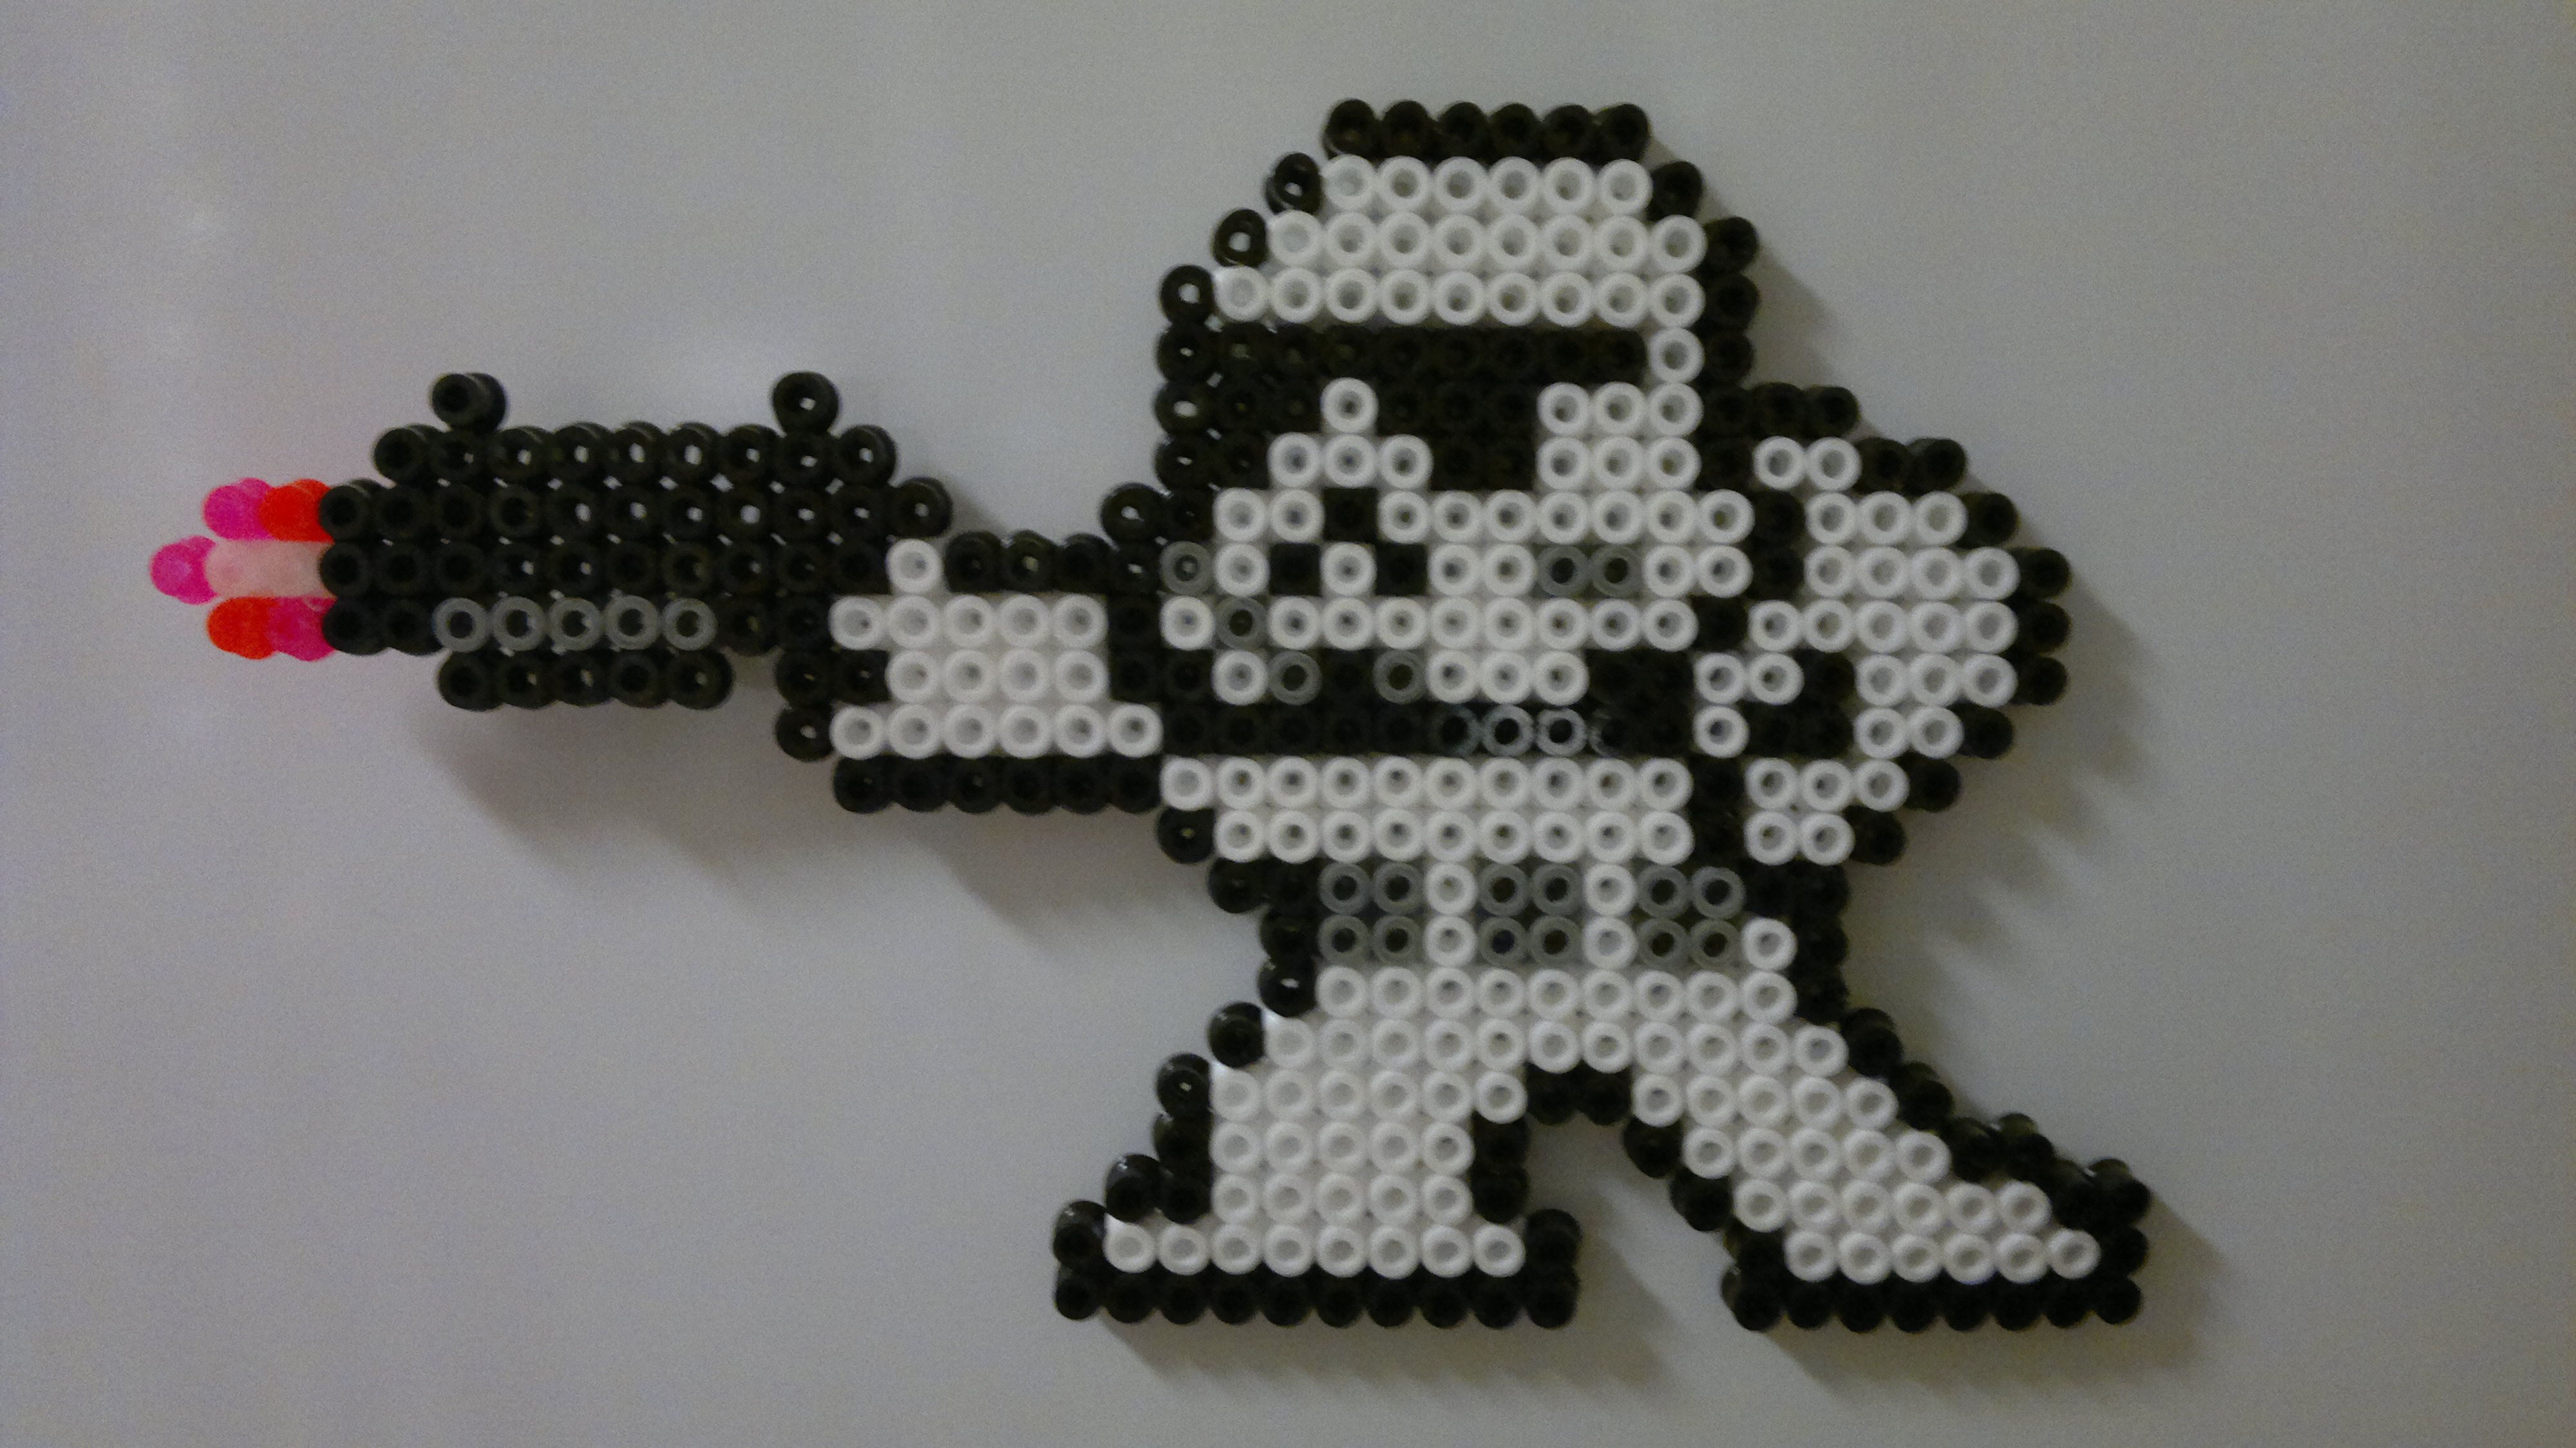 Neon Stormtrooper Star Wars Hama Beads By Hamatiija